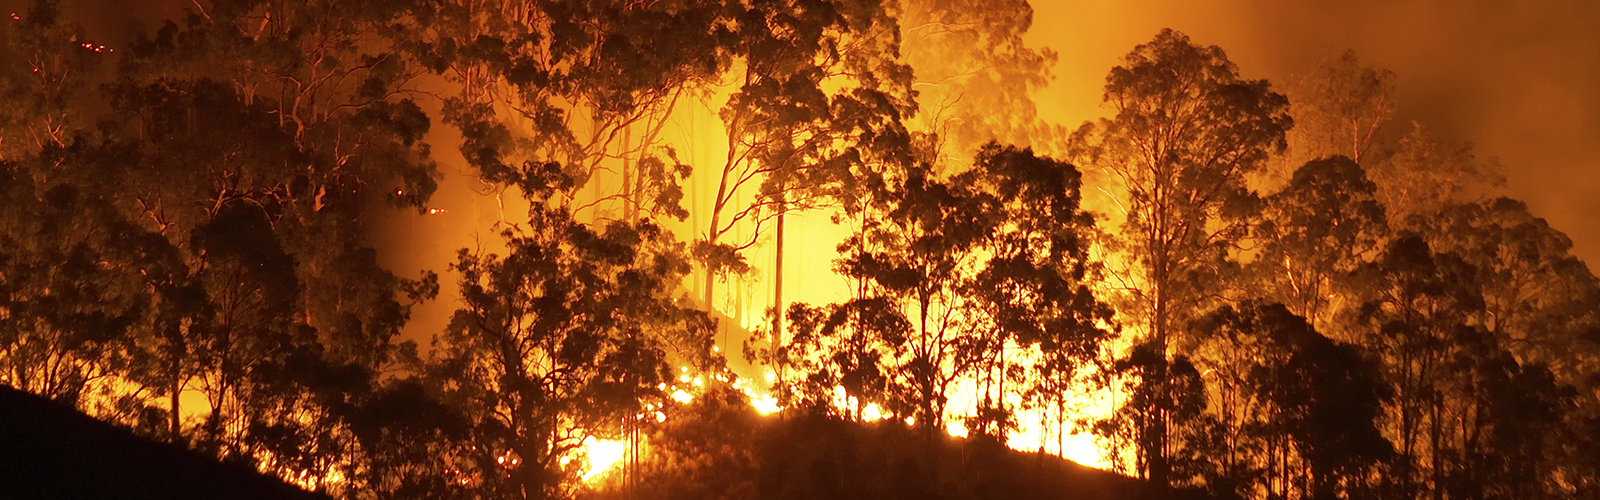 bc_bushfires_0 Online Form Builder Australia on